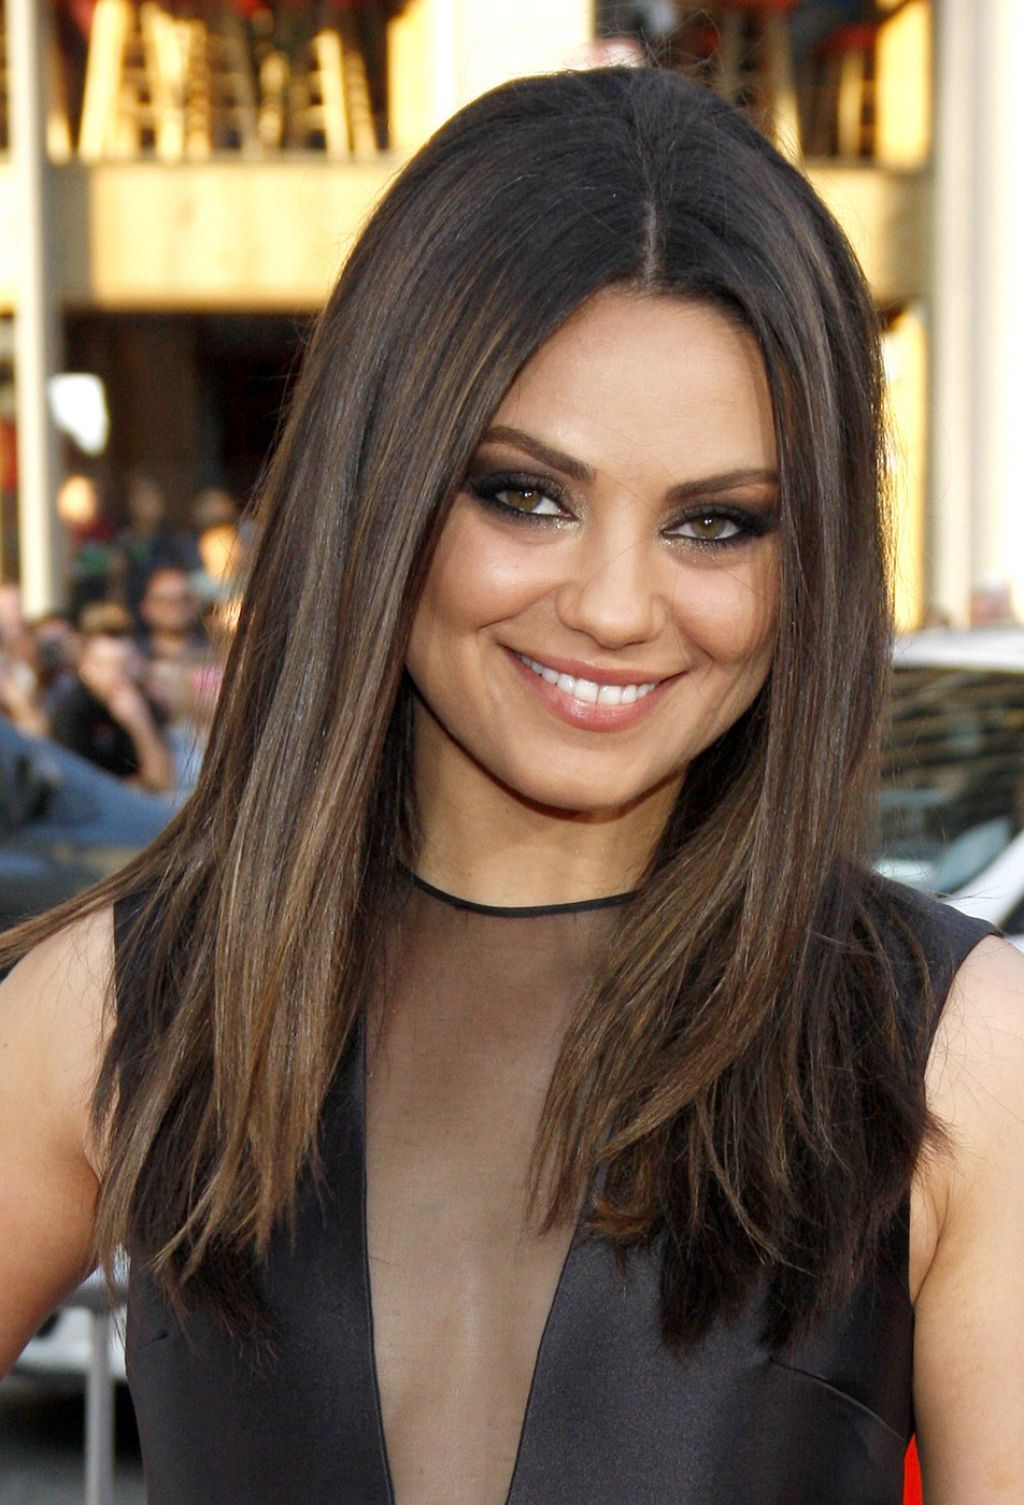 Mila Kunis Haircut